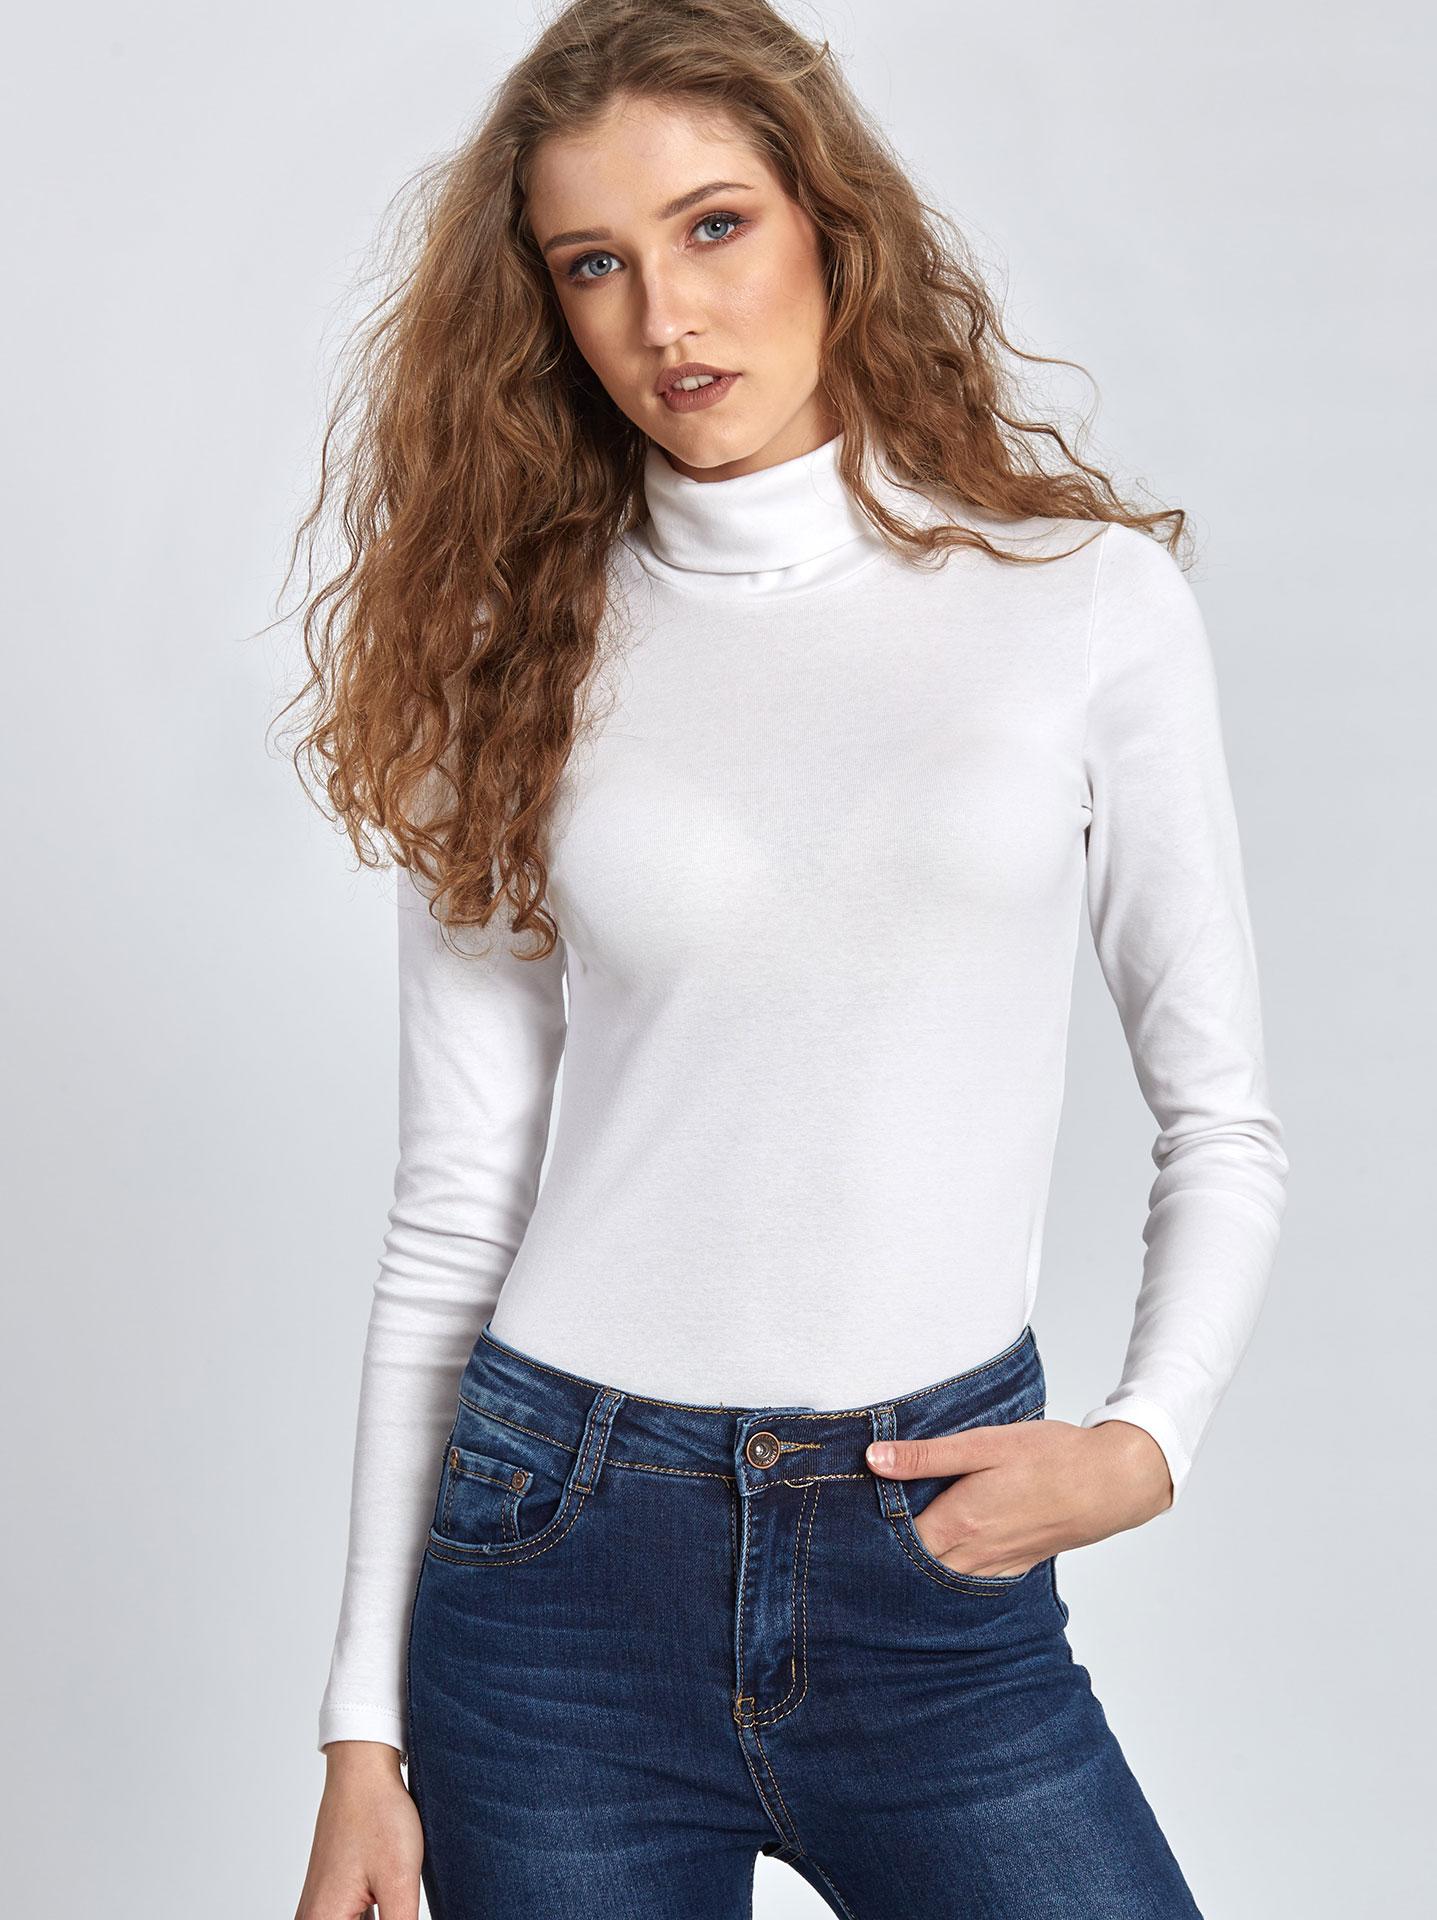 c4a9609fb32c Ζιβάγκο μπλούζα σε λευκο